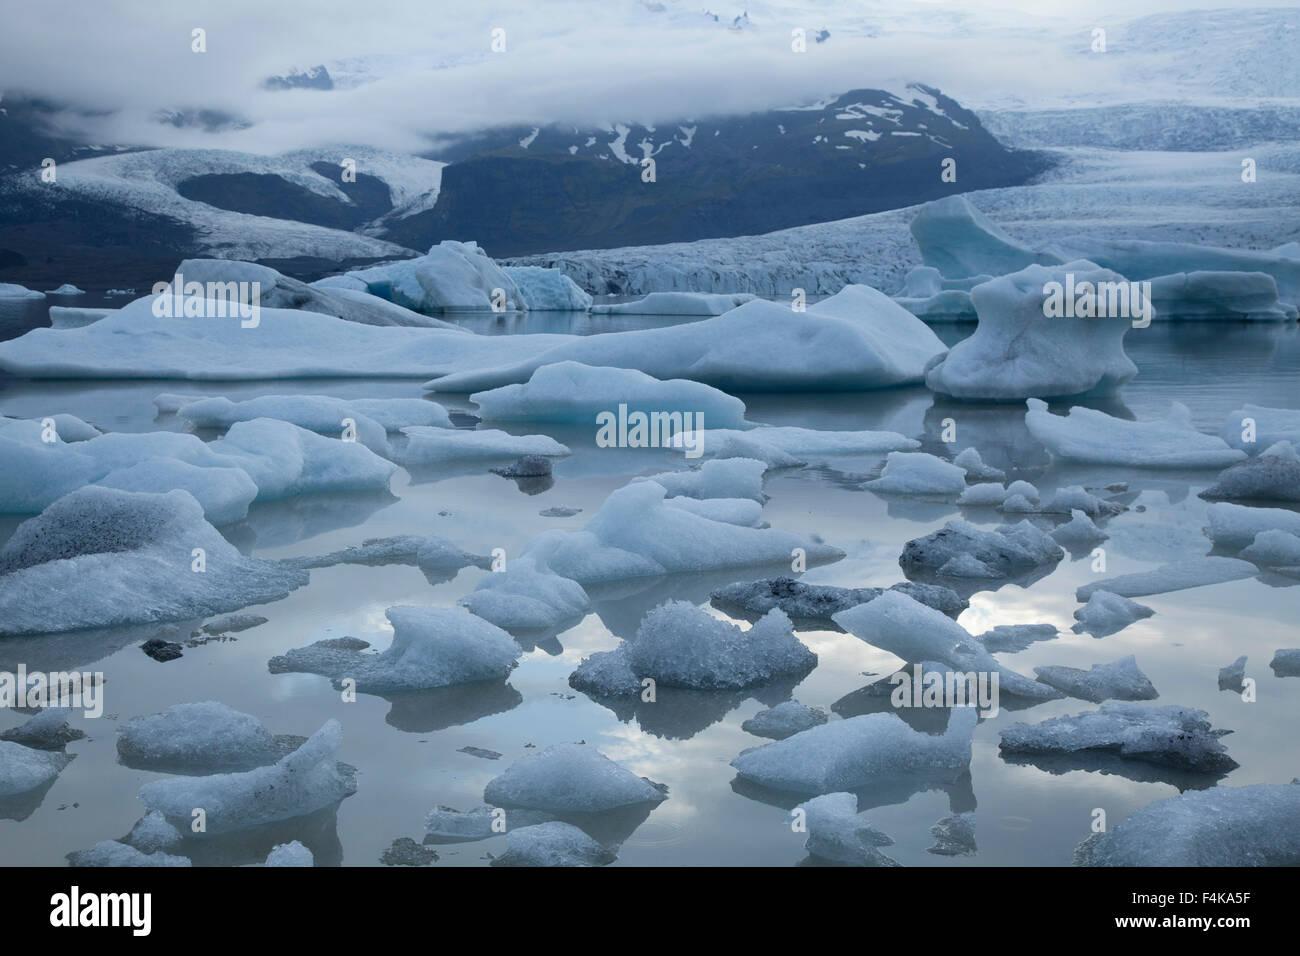 Icebergs in Fjallsarlon lagoon, beneath Fjallsjokull glacier, Vatnajokull National Park, Sudhurland, Iceland. - Stock Image